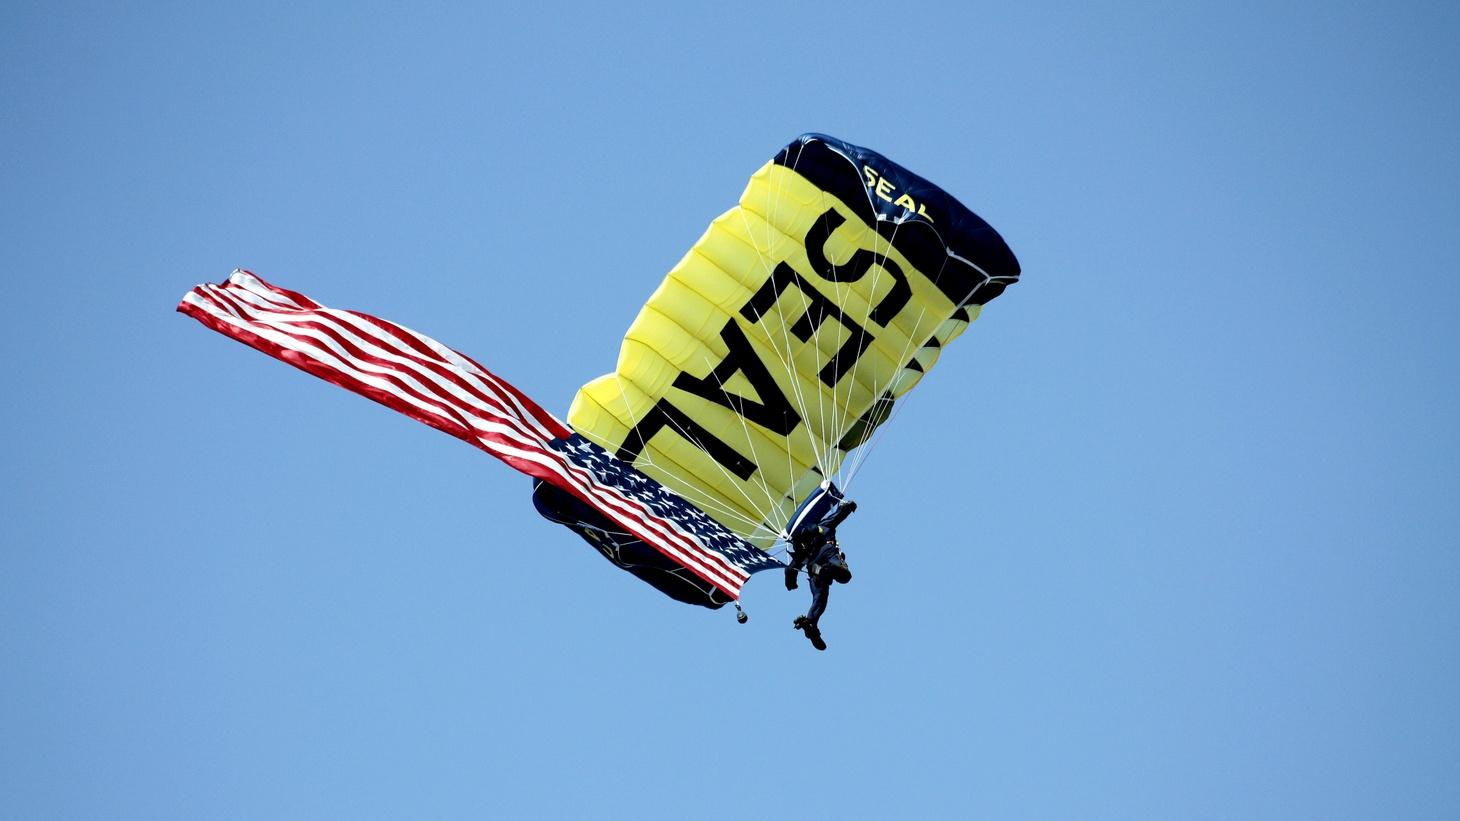 A member of the U.S. Navy Seals parachute team.